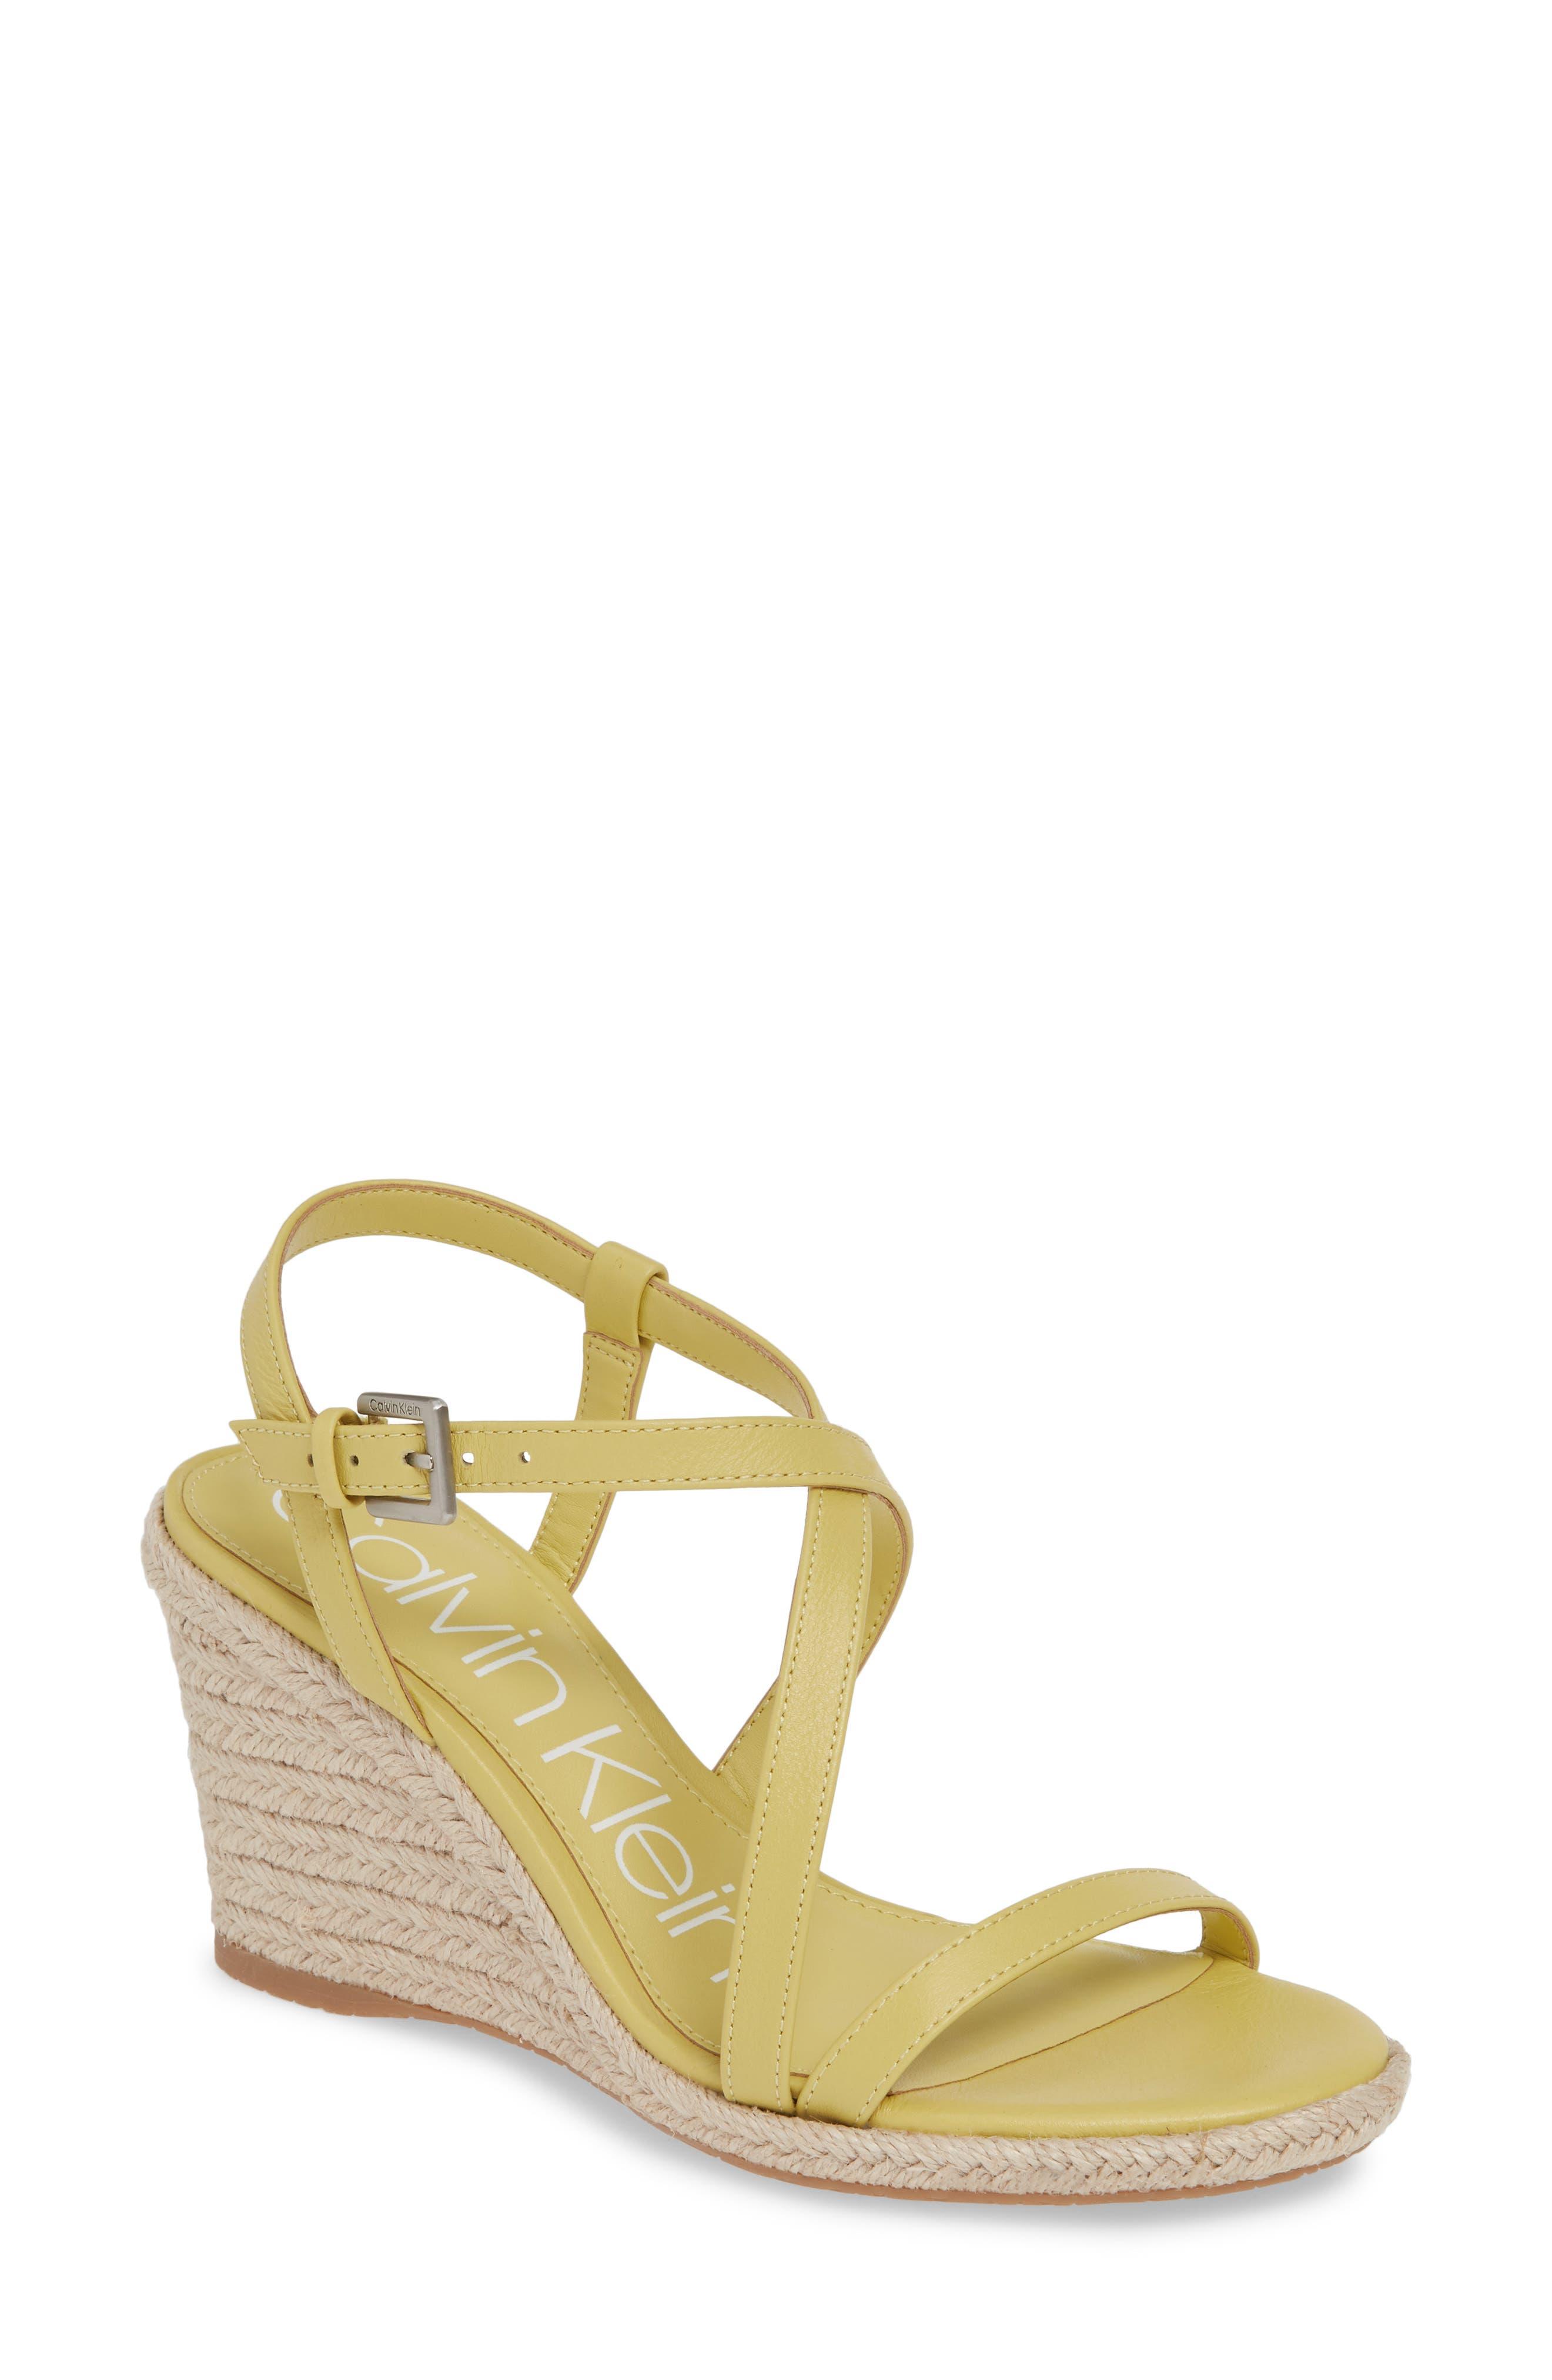 be87f28a9b8 Calvin Klein Bellemine Espadrille Wedge Sandal